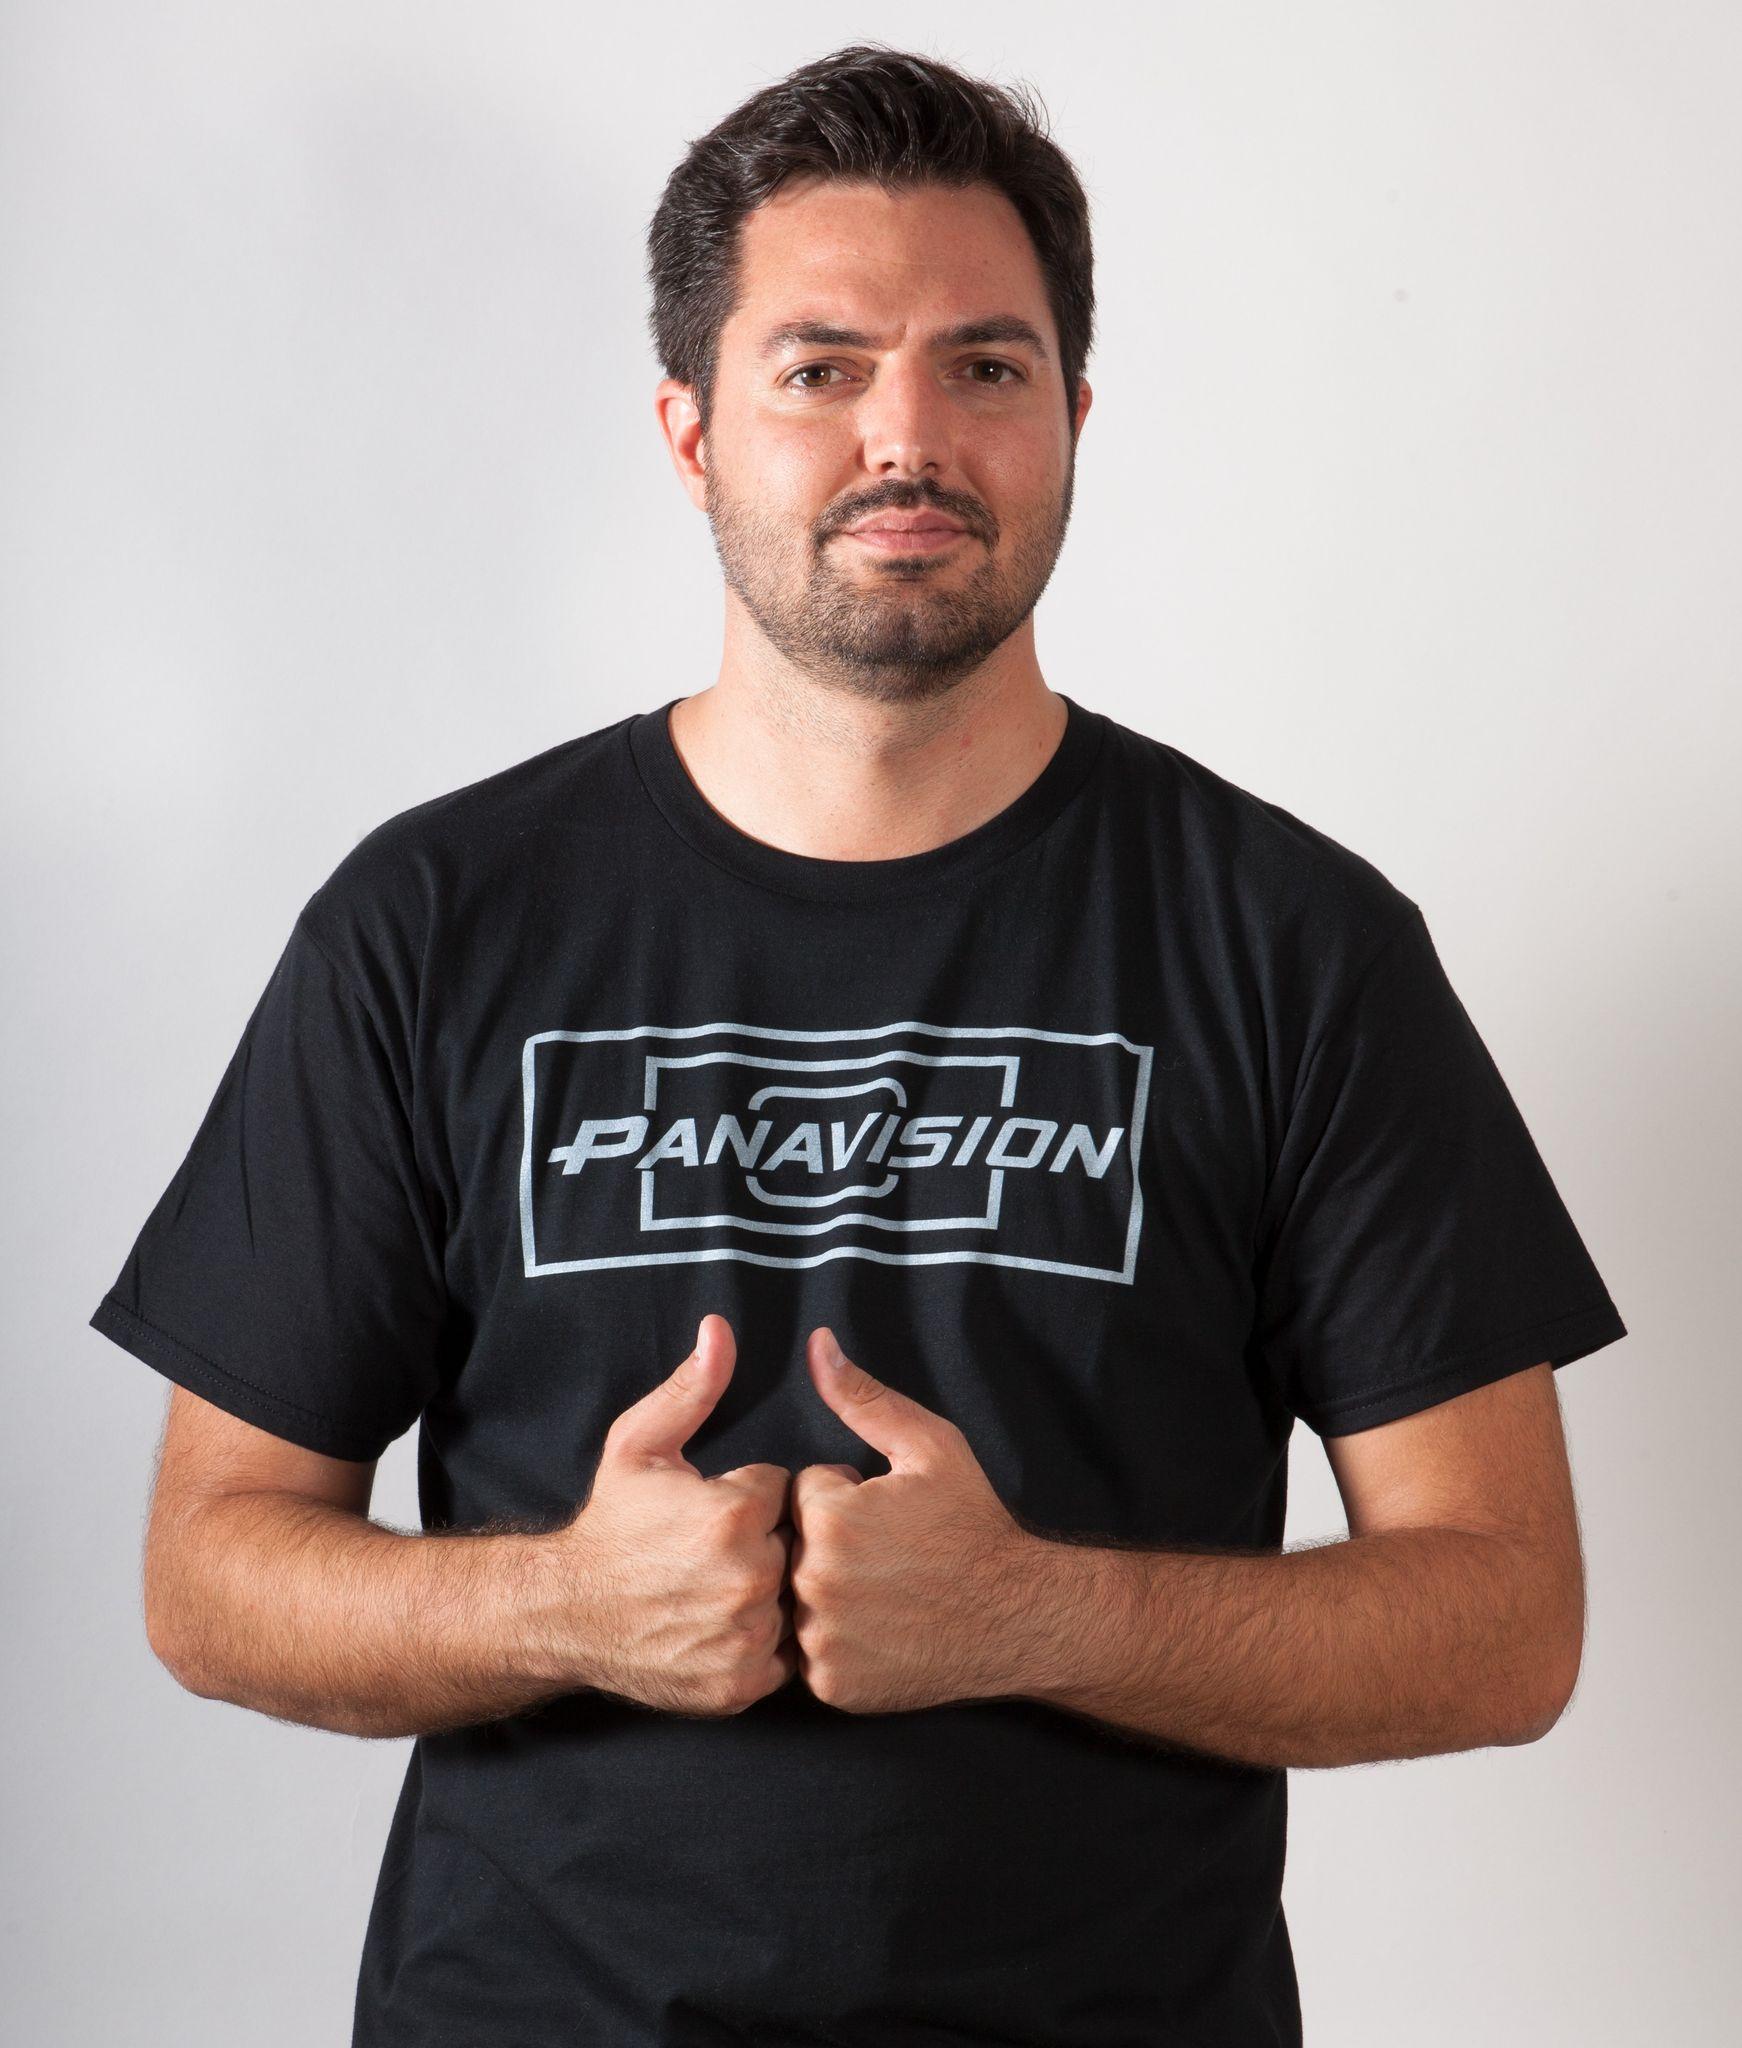 Alessandro Lopreino